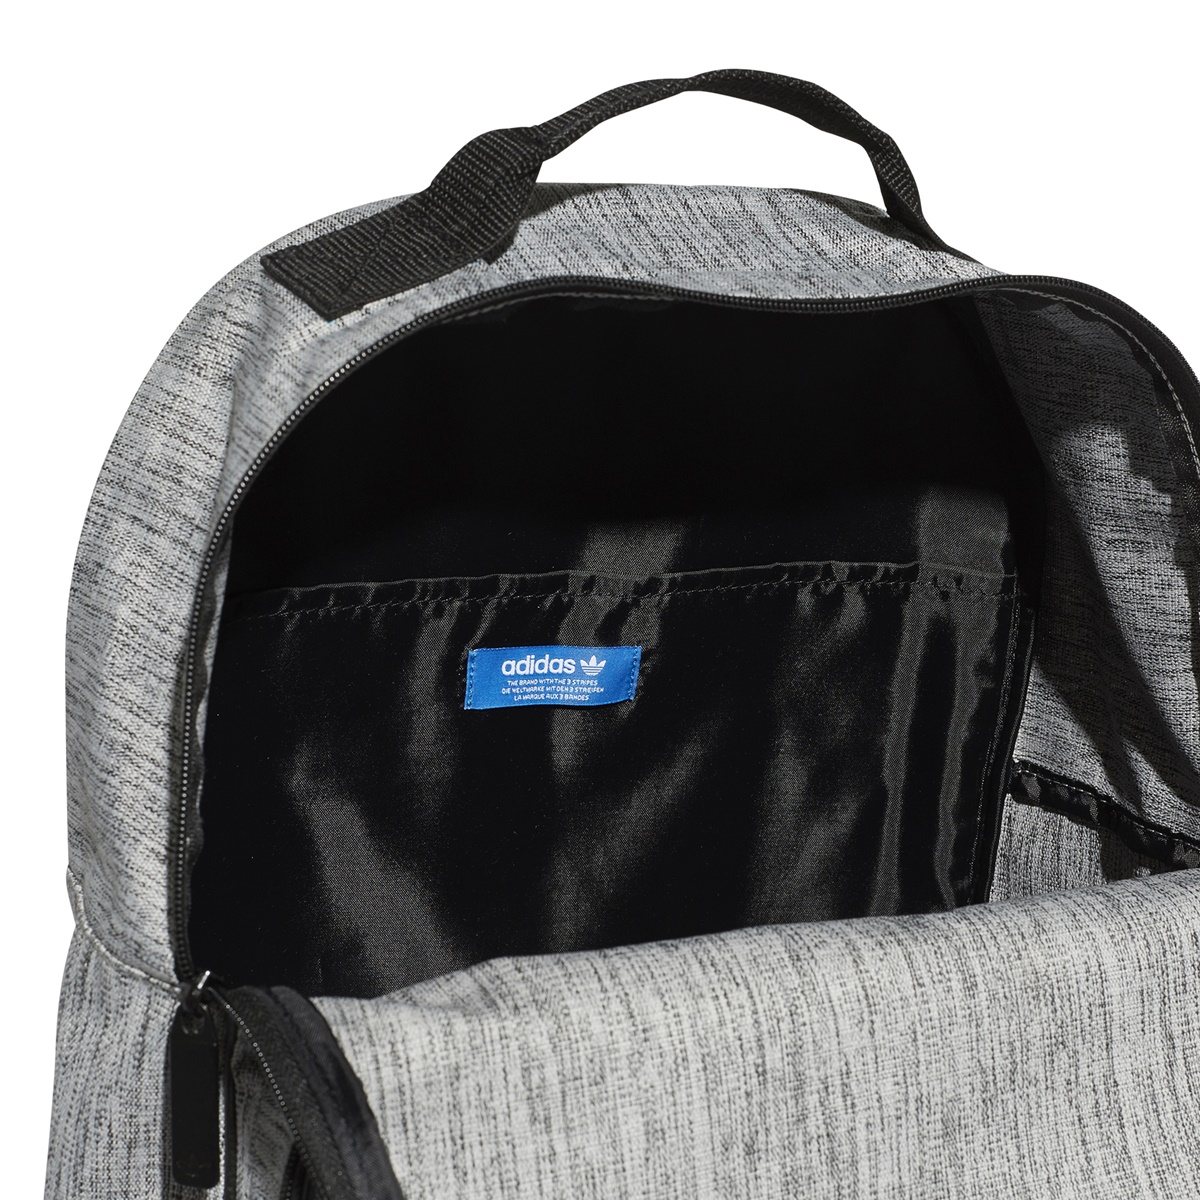 845255631 Greyblack Classic Originals Img Casual Mochila 6 Adidas Trefoil qXFBBw